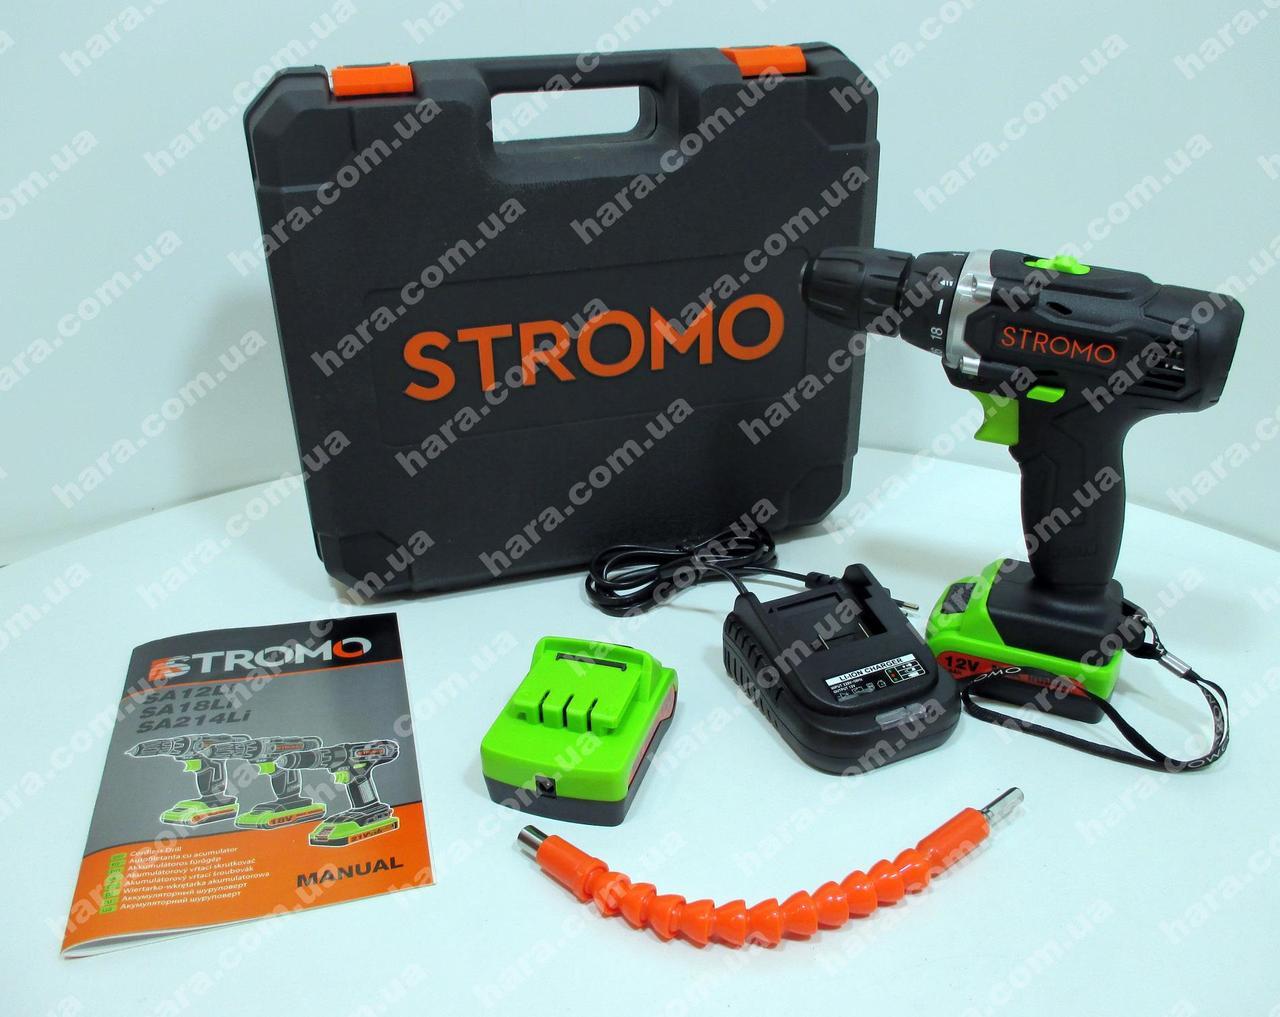 Шуруповерт STROMO SA12Li (2 Акк., гибкий вал)